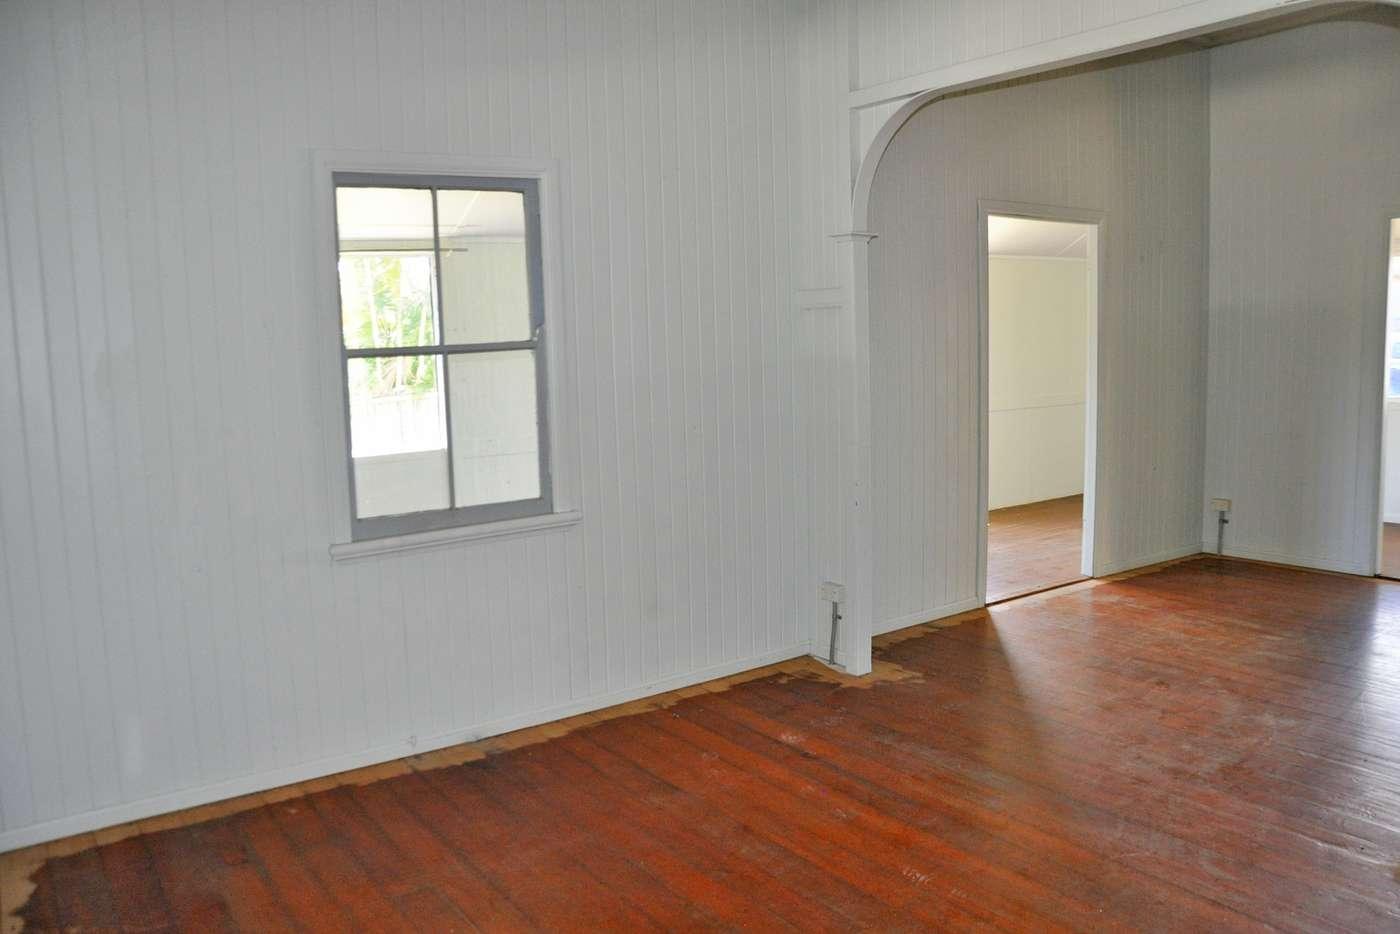 Seventh view of Homely house listing, 32 Strattmann Street, Mareeba QLD 4880